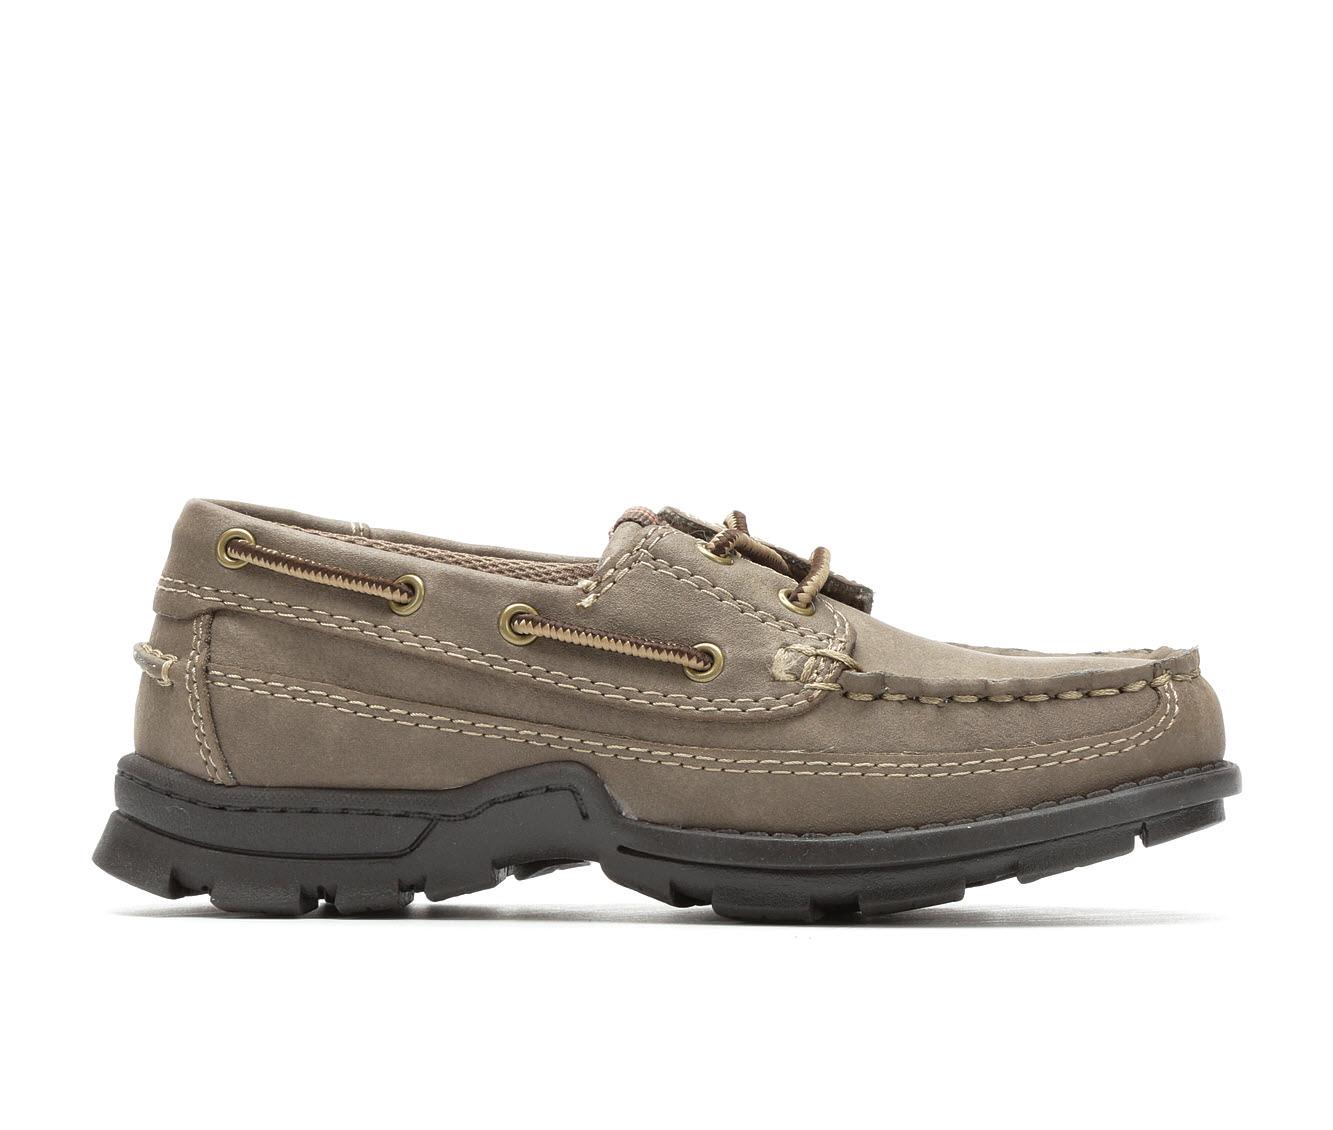 Boys' Madison Ave. Derrick Boat Shoes (Beige)